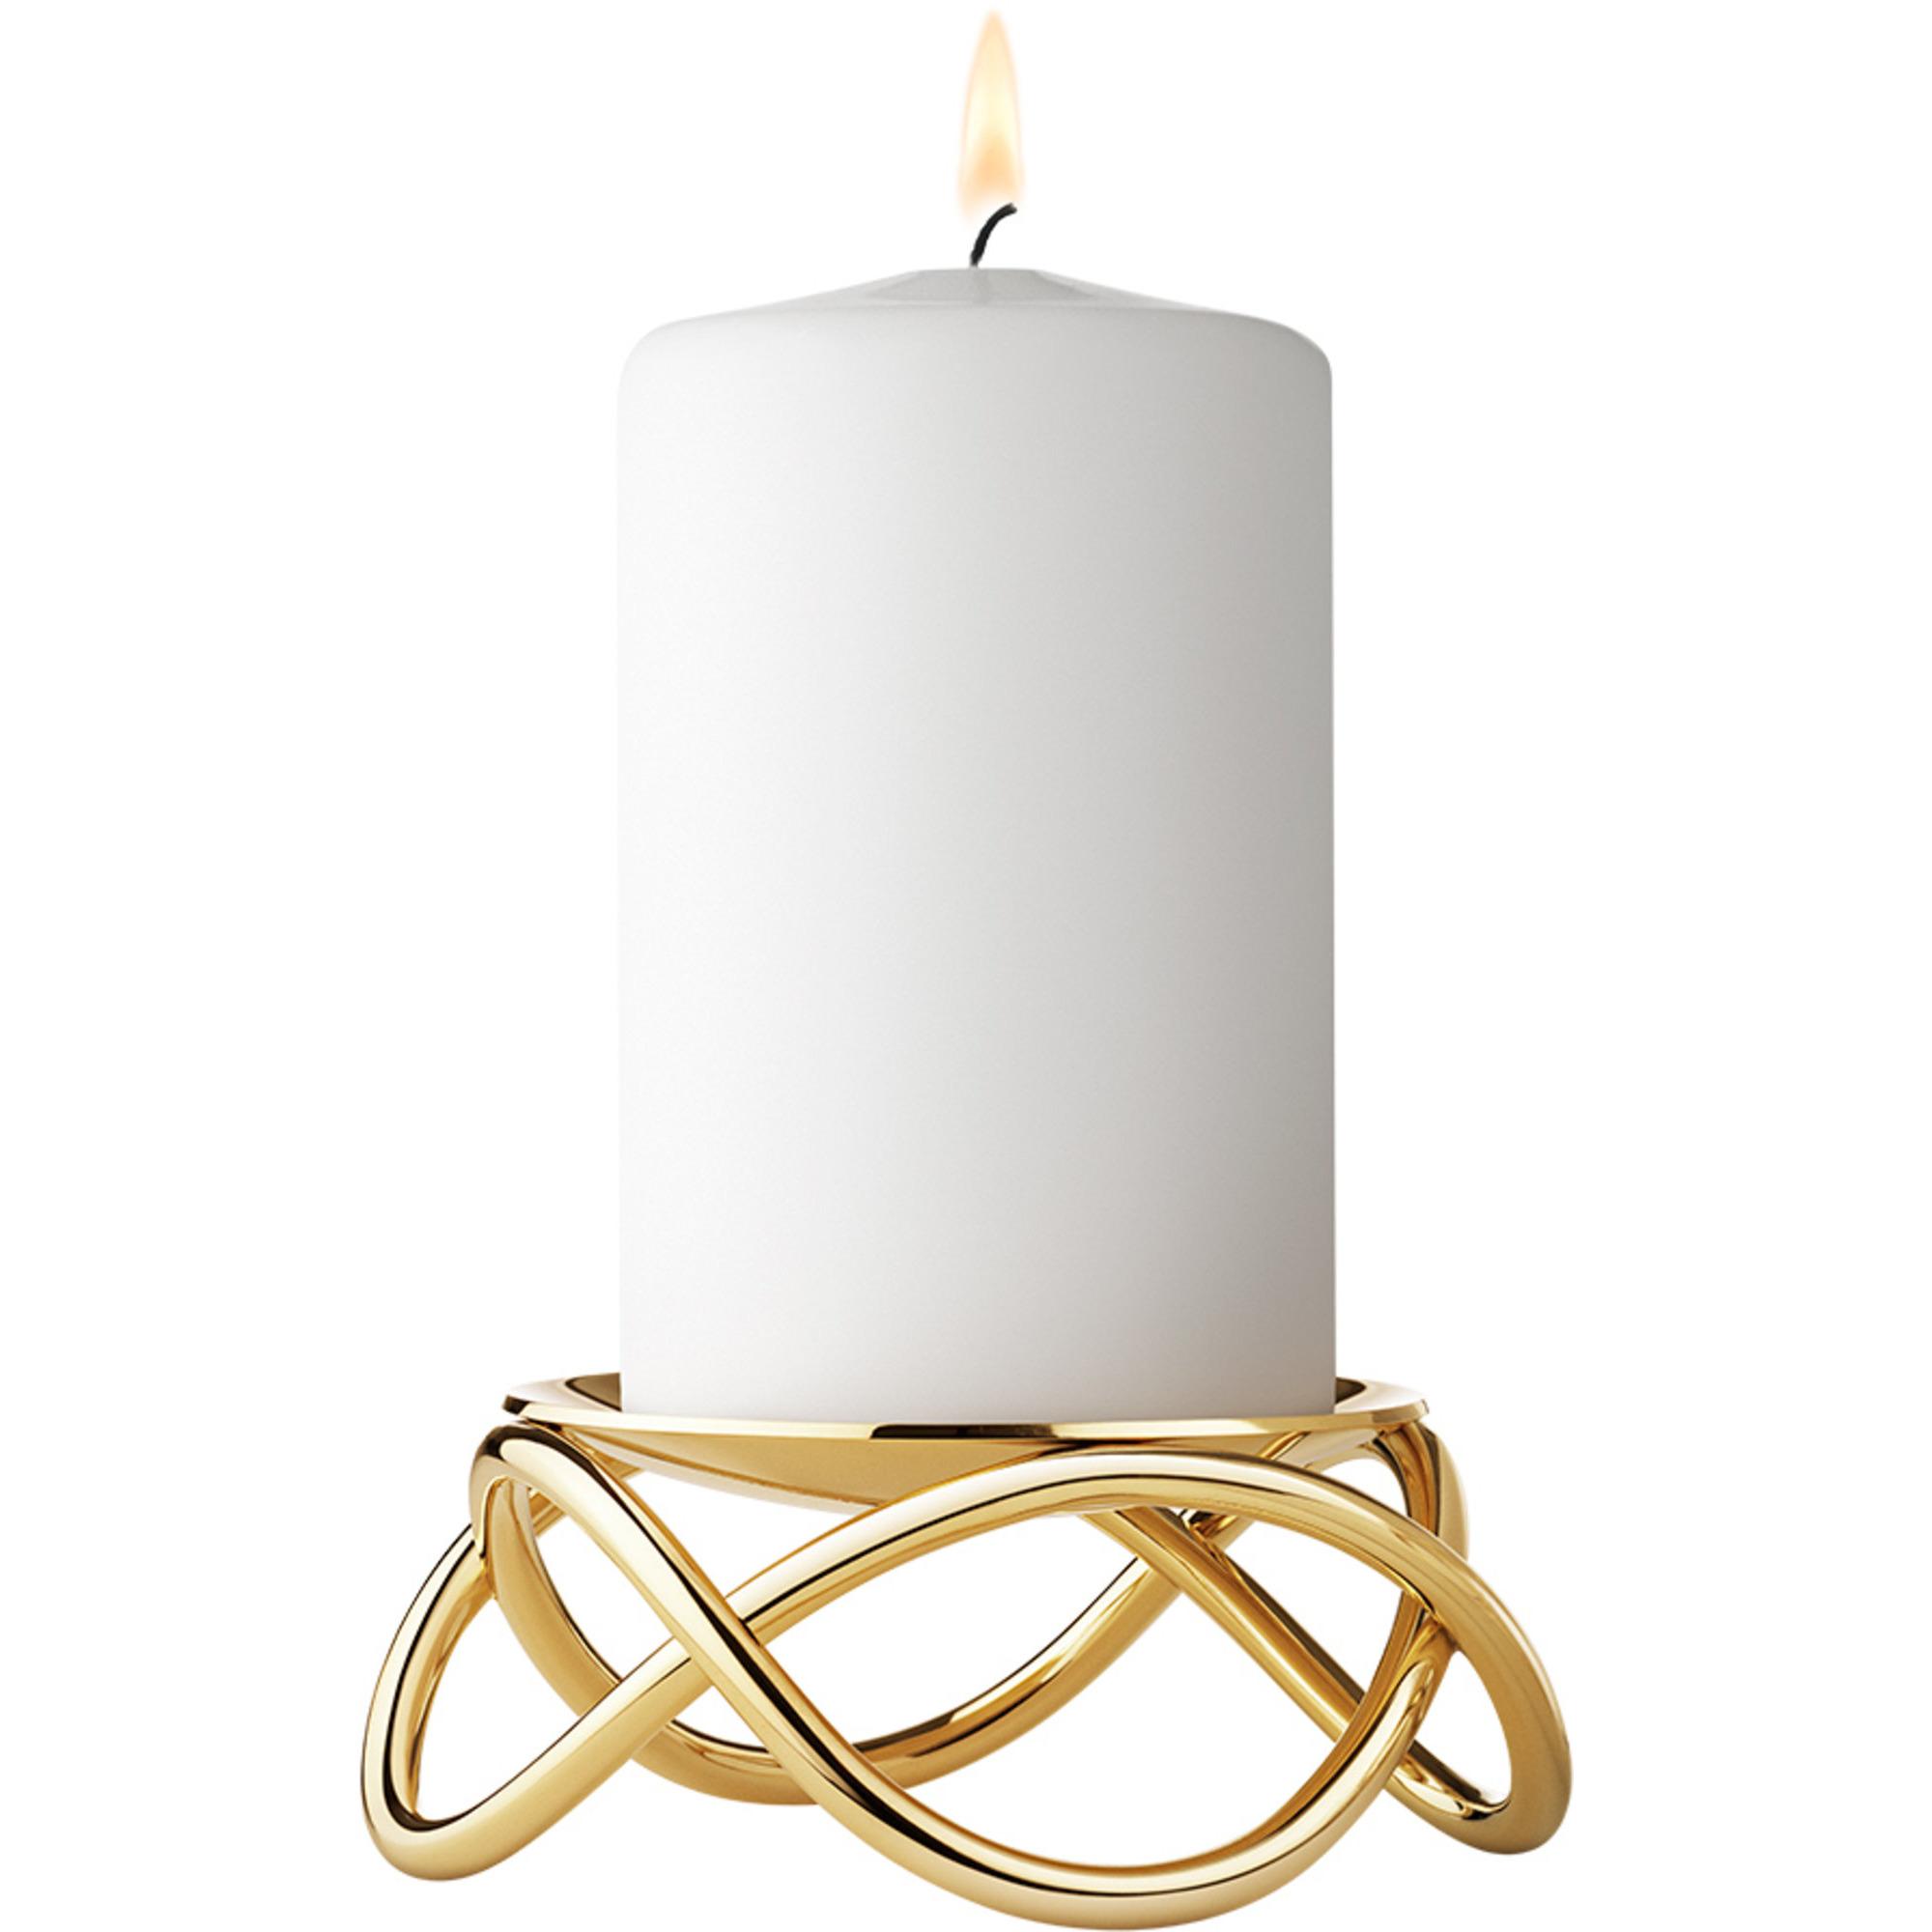 Georg Jensen Glow Ljusstake Förgyllt rostfritt stål Guld